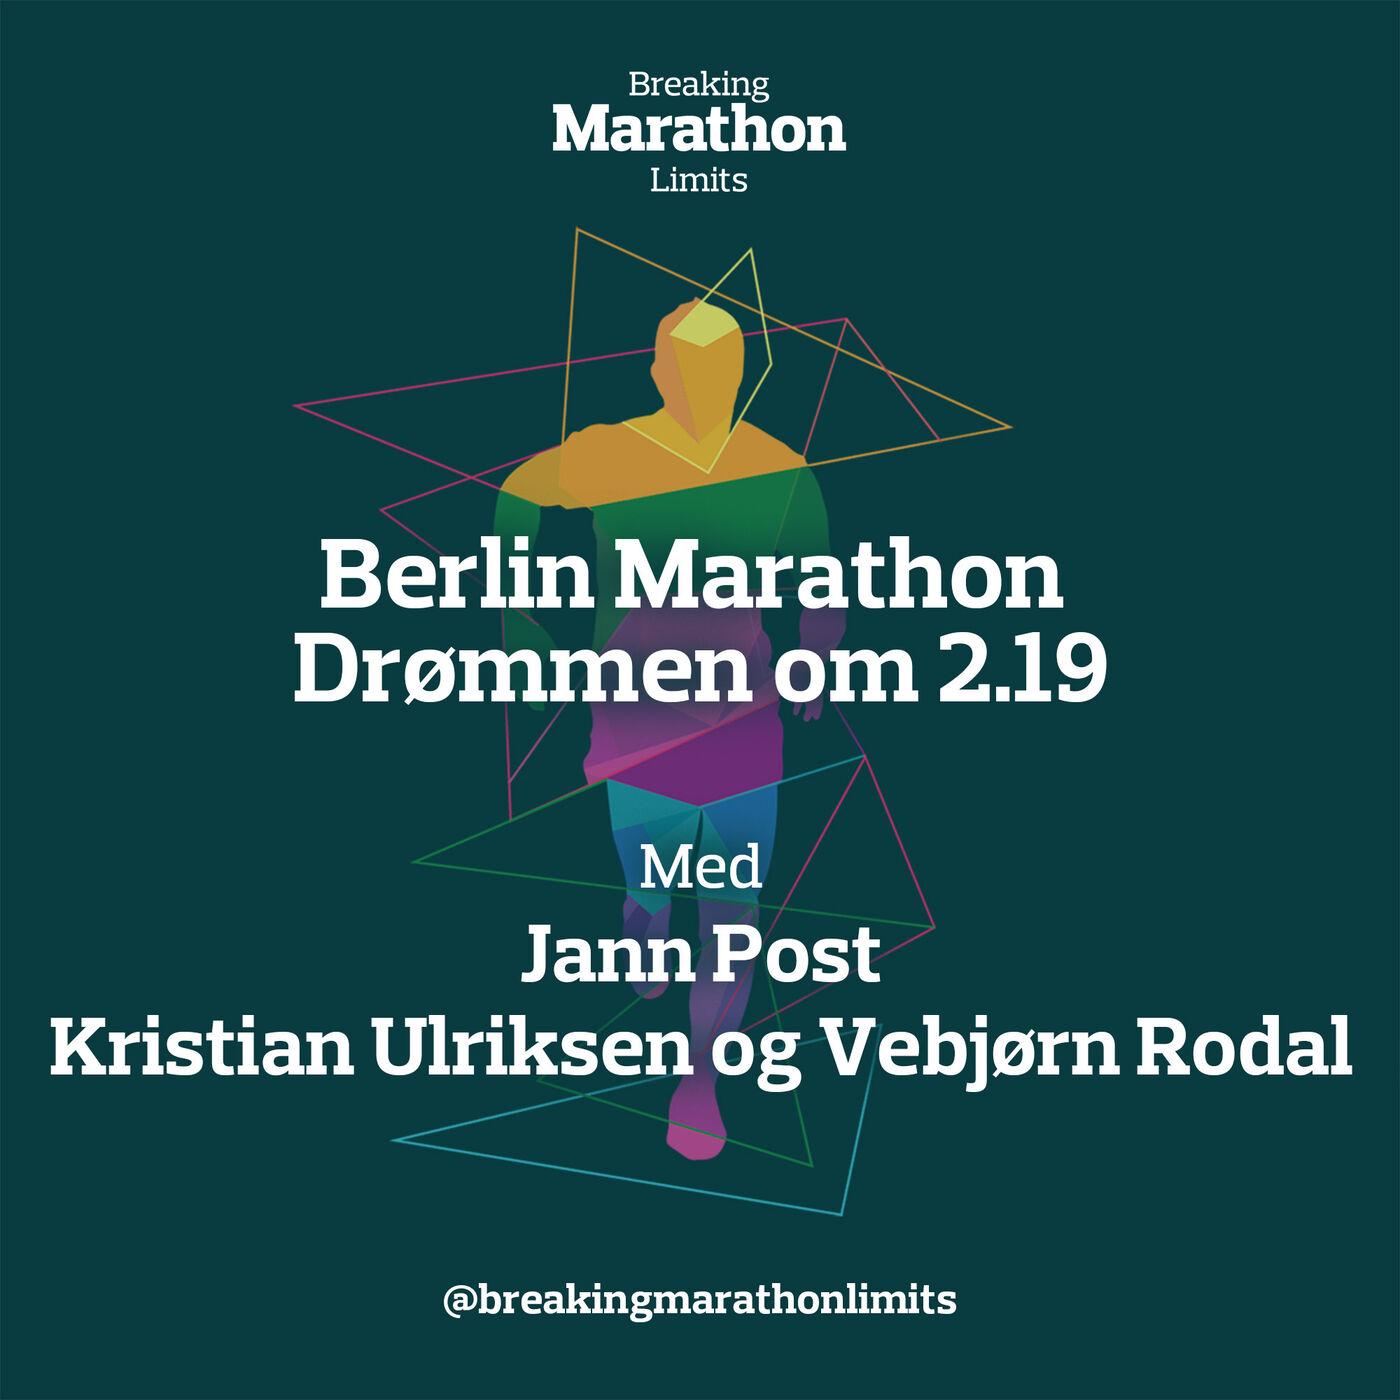 Berlin Marathon - Drømmen og 2.19